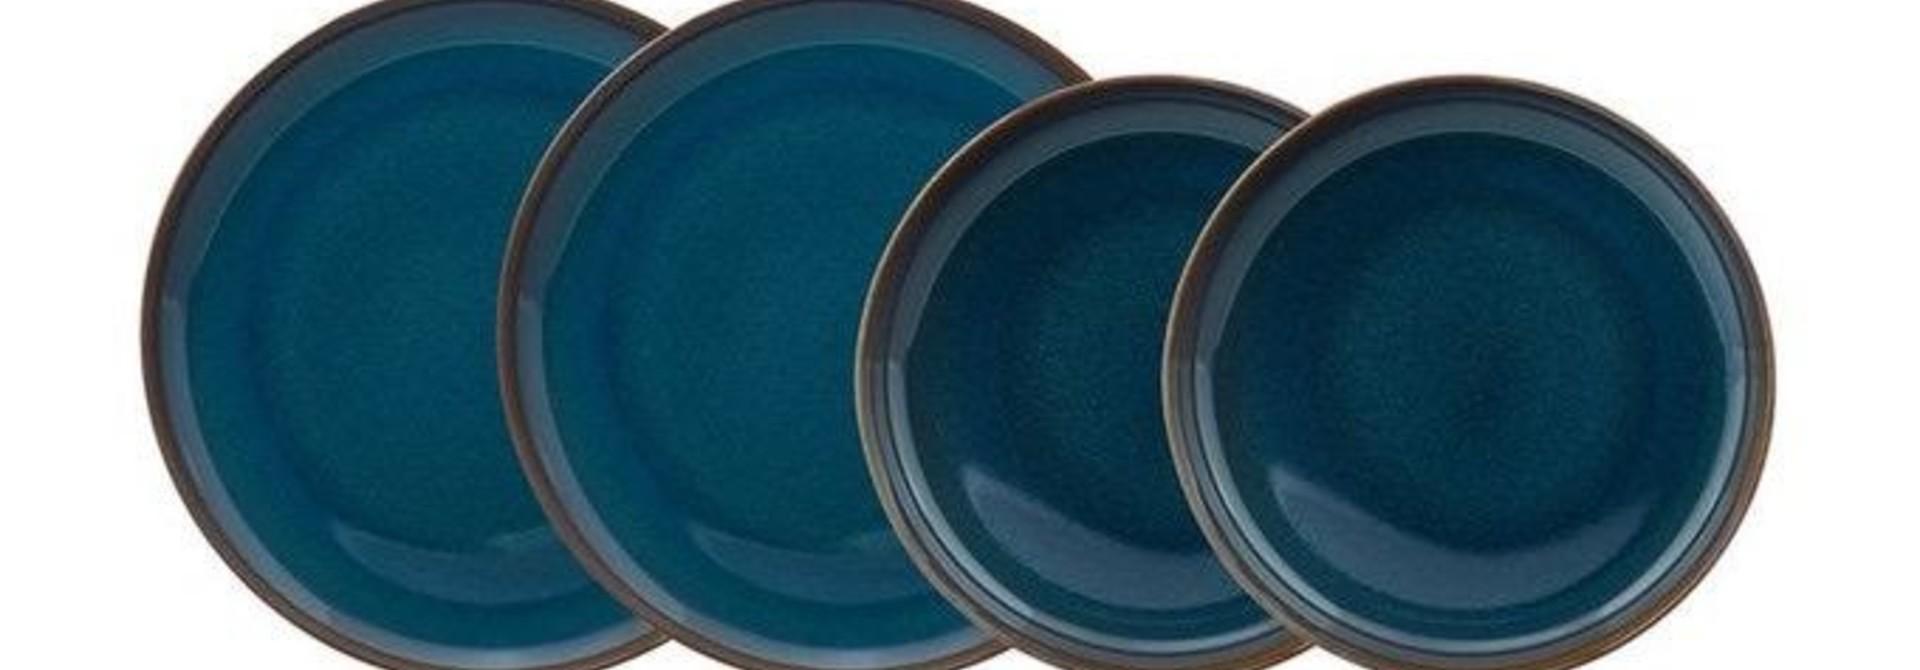 VILLEROY & BOCH - Crafted Denim Table Service 6pcs